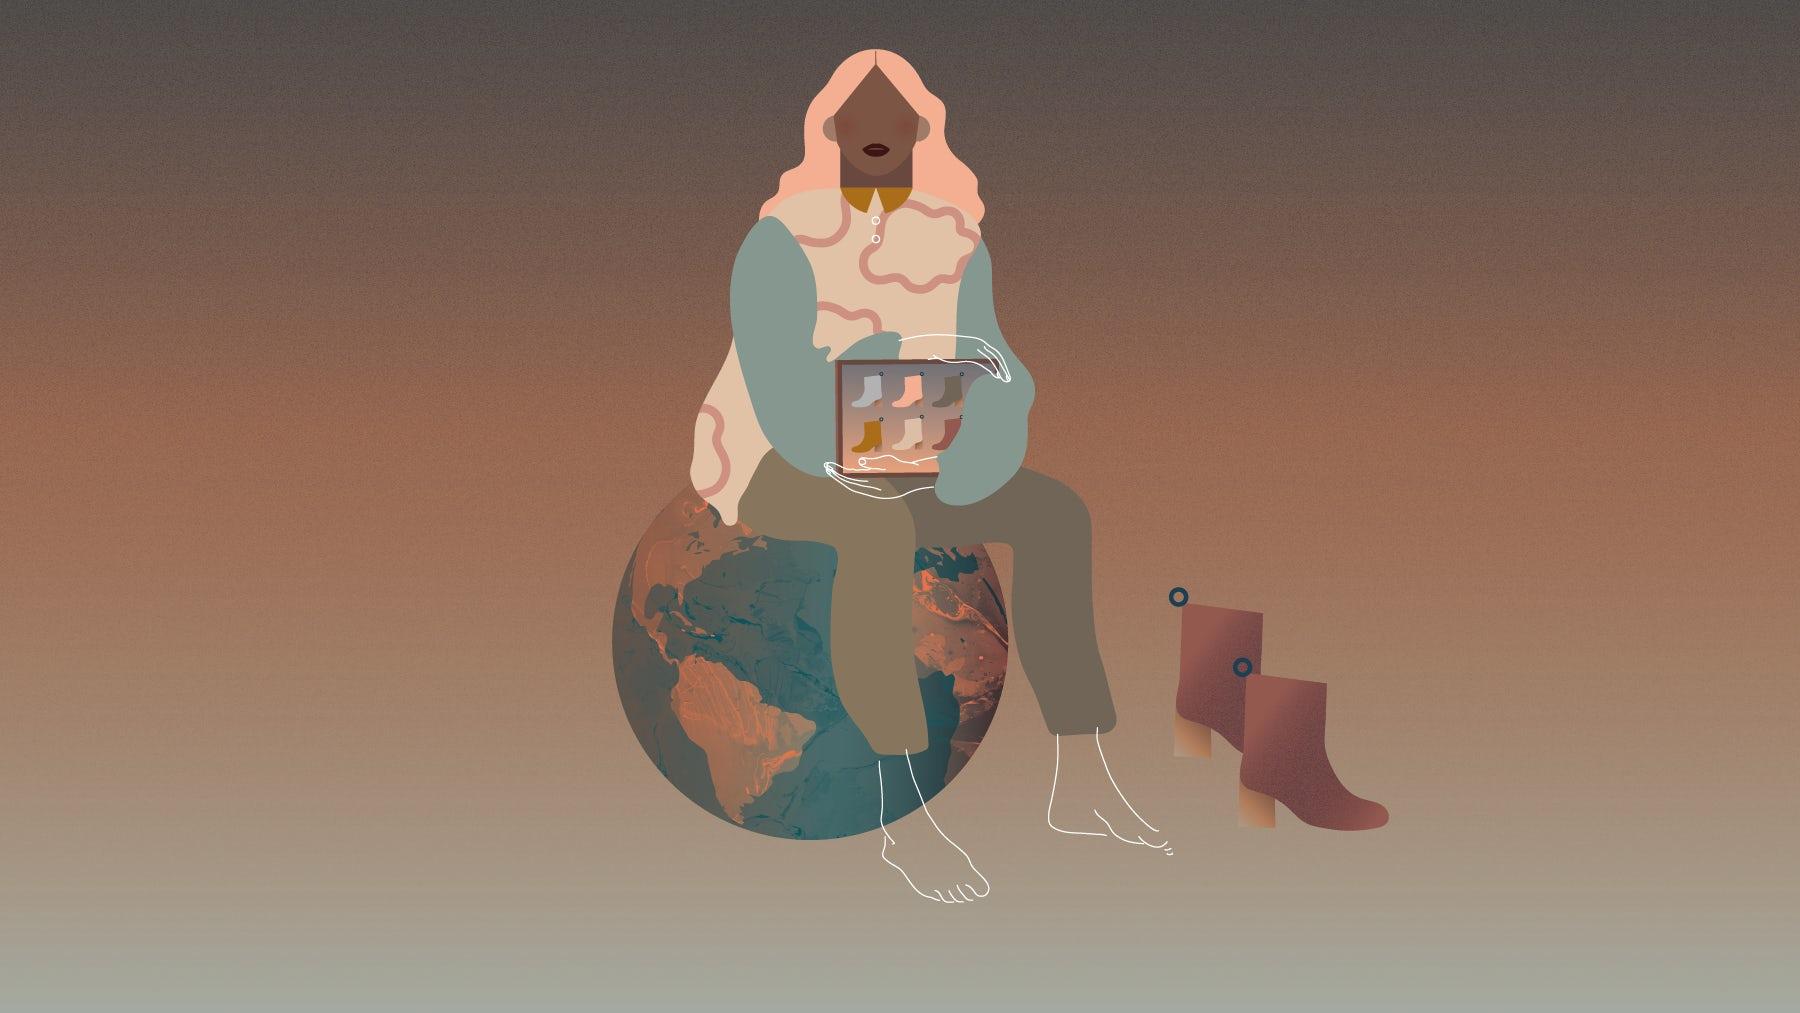 Illustration by Elin Svensson